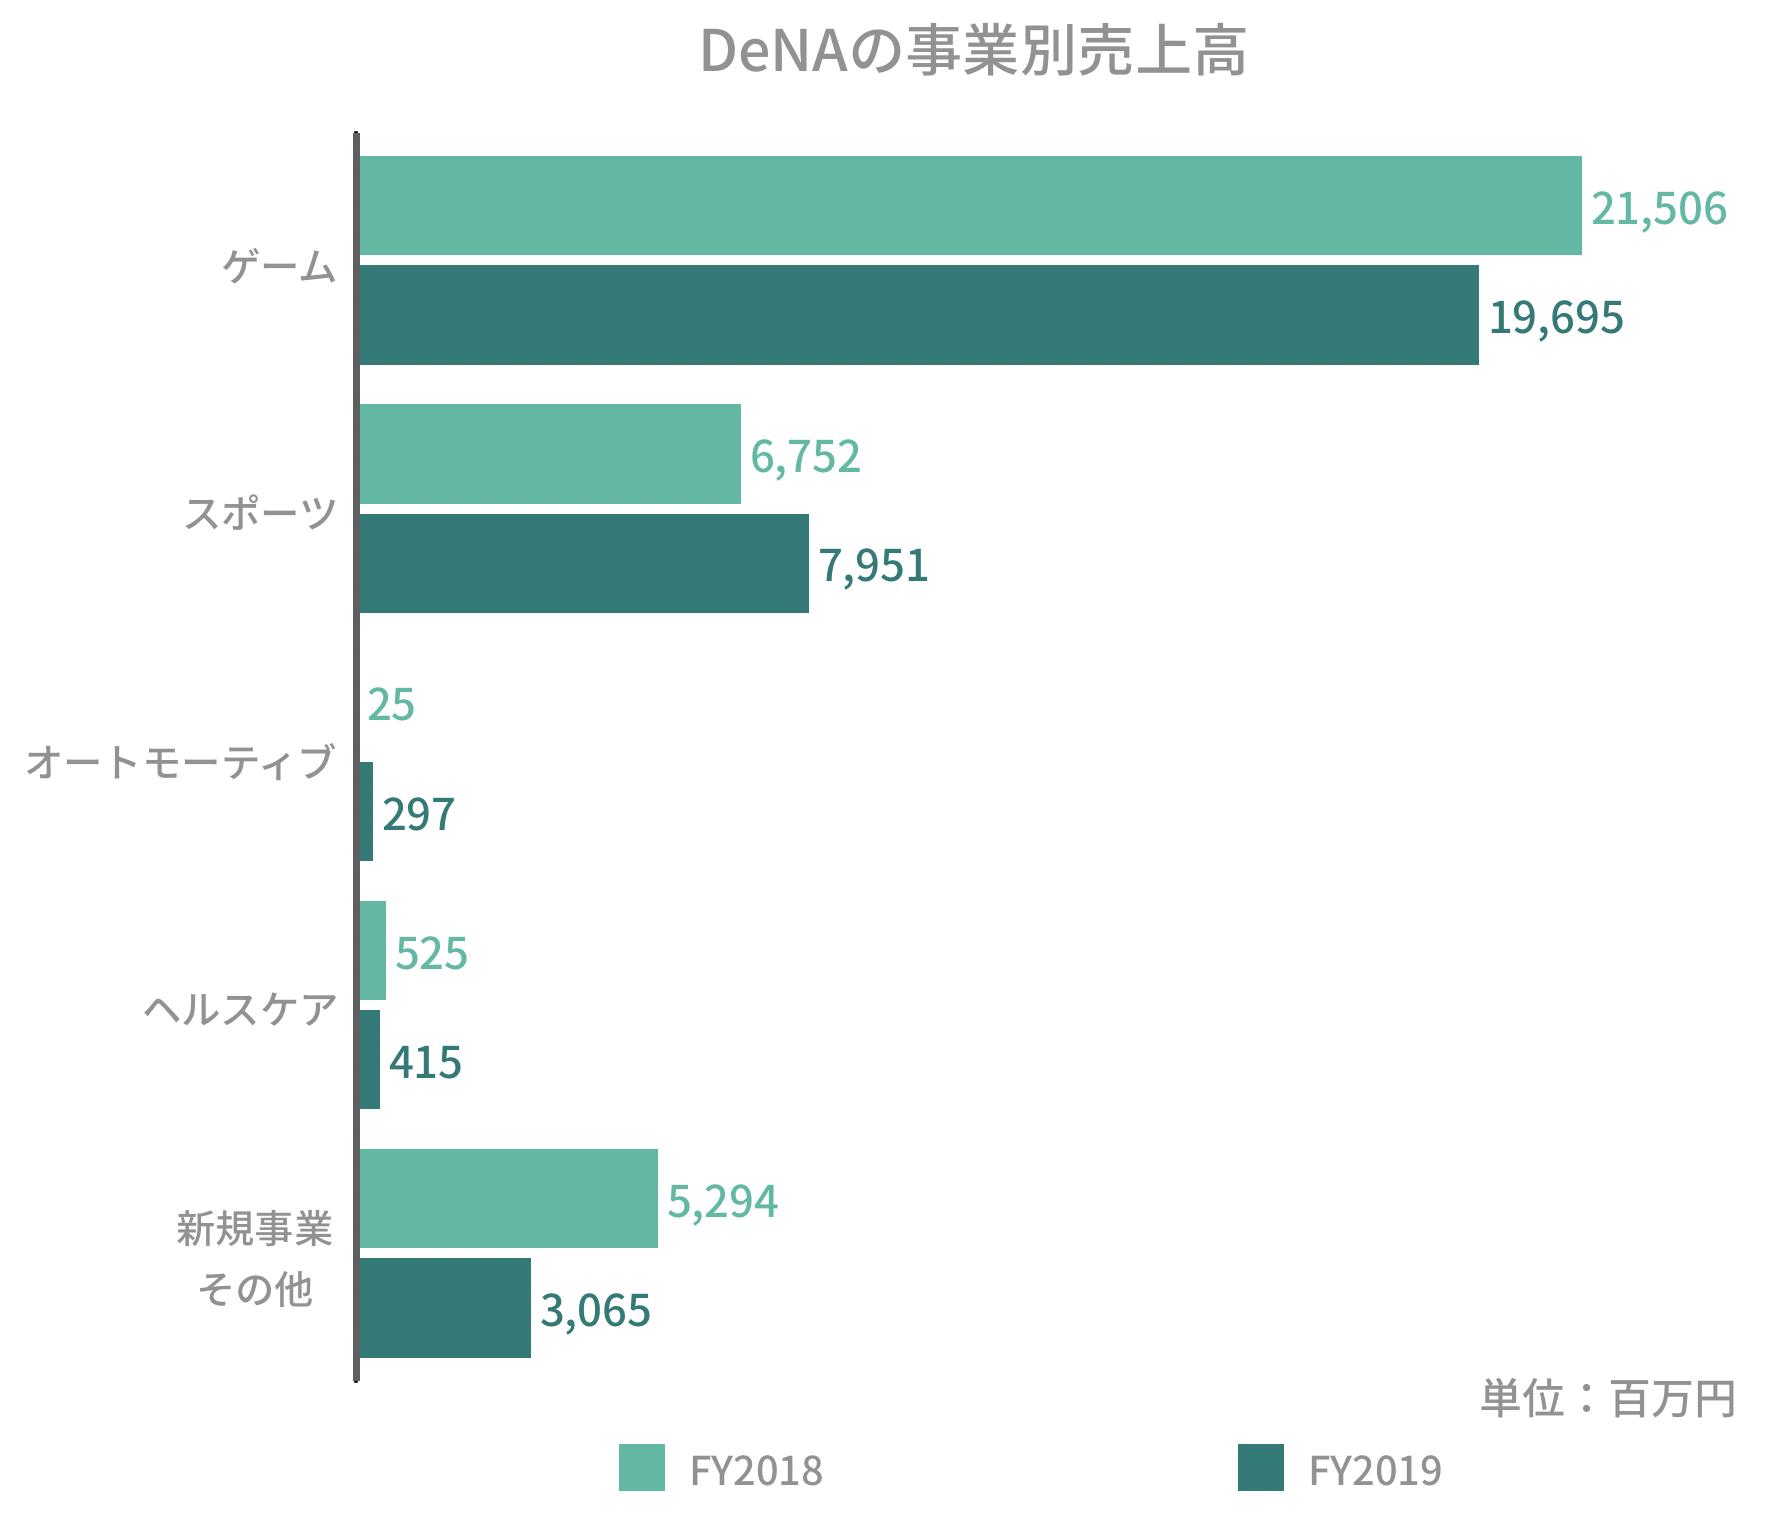 DeNAの事業別売上高